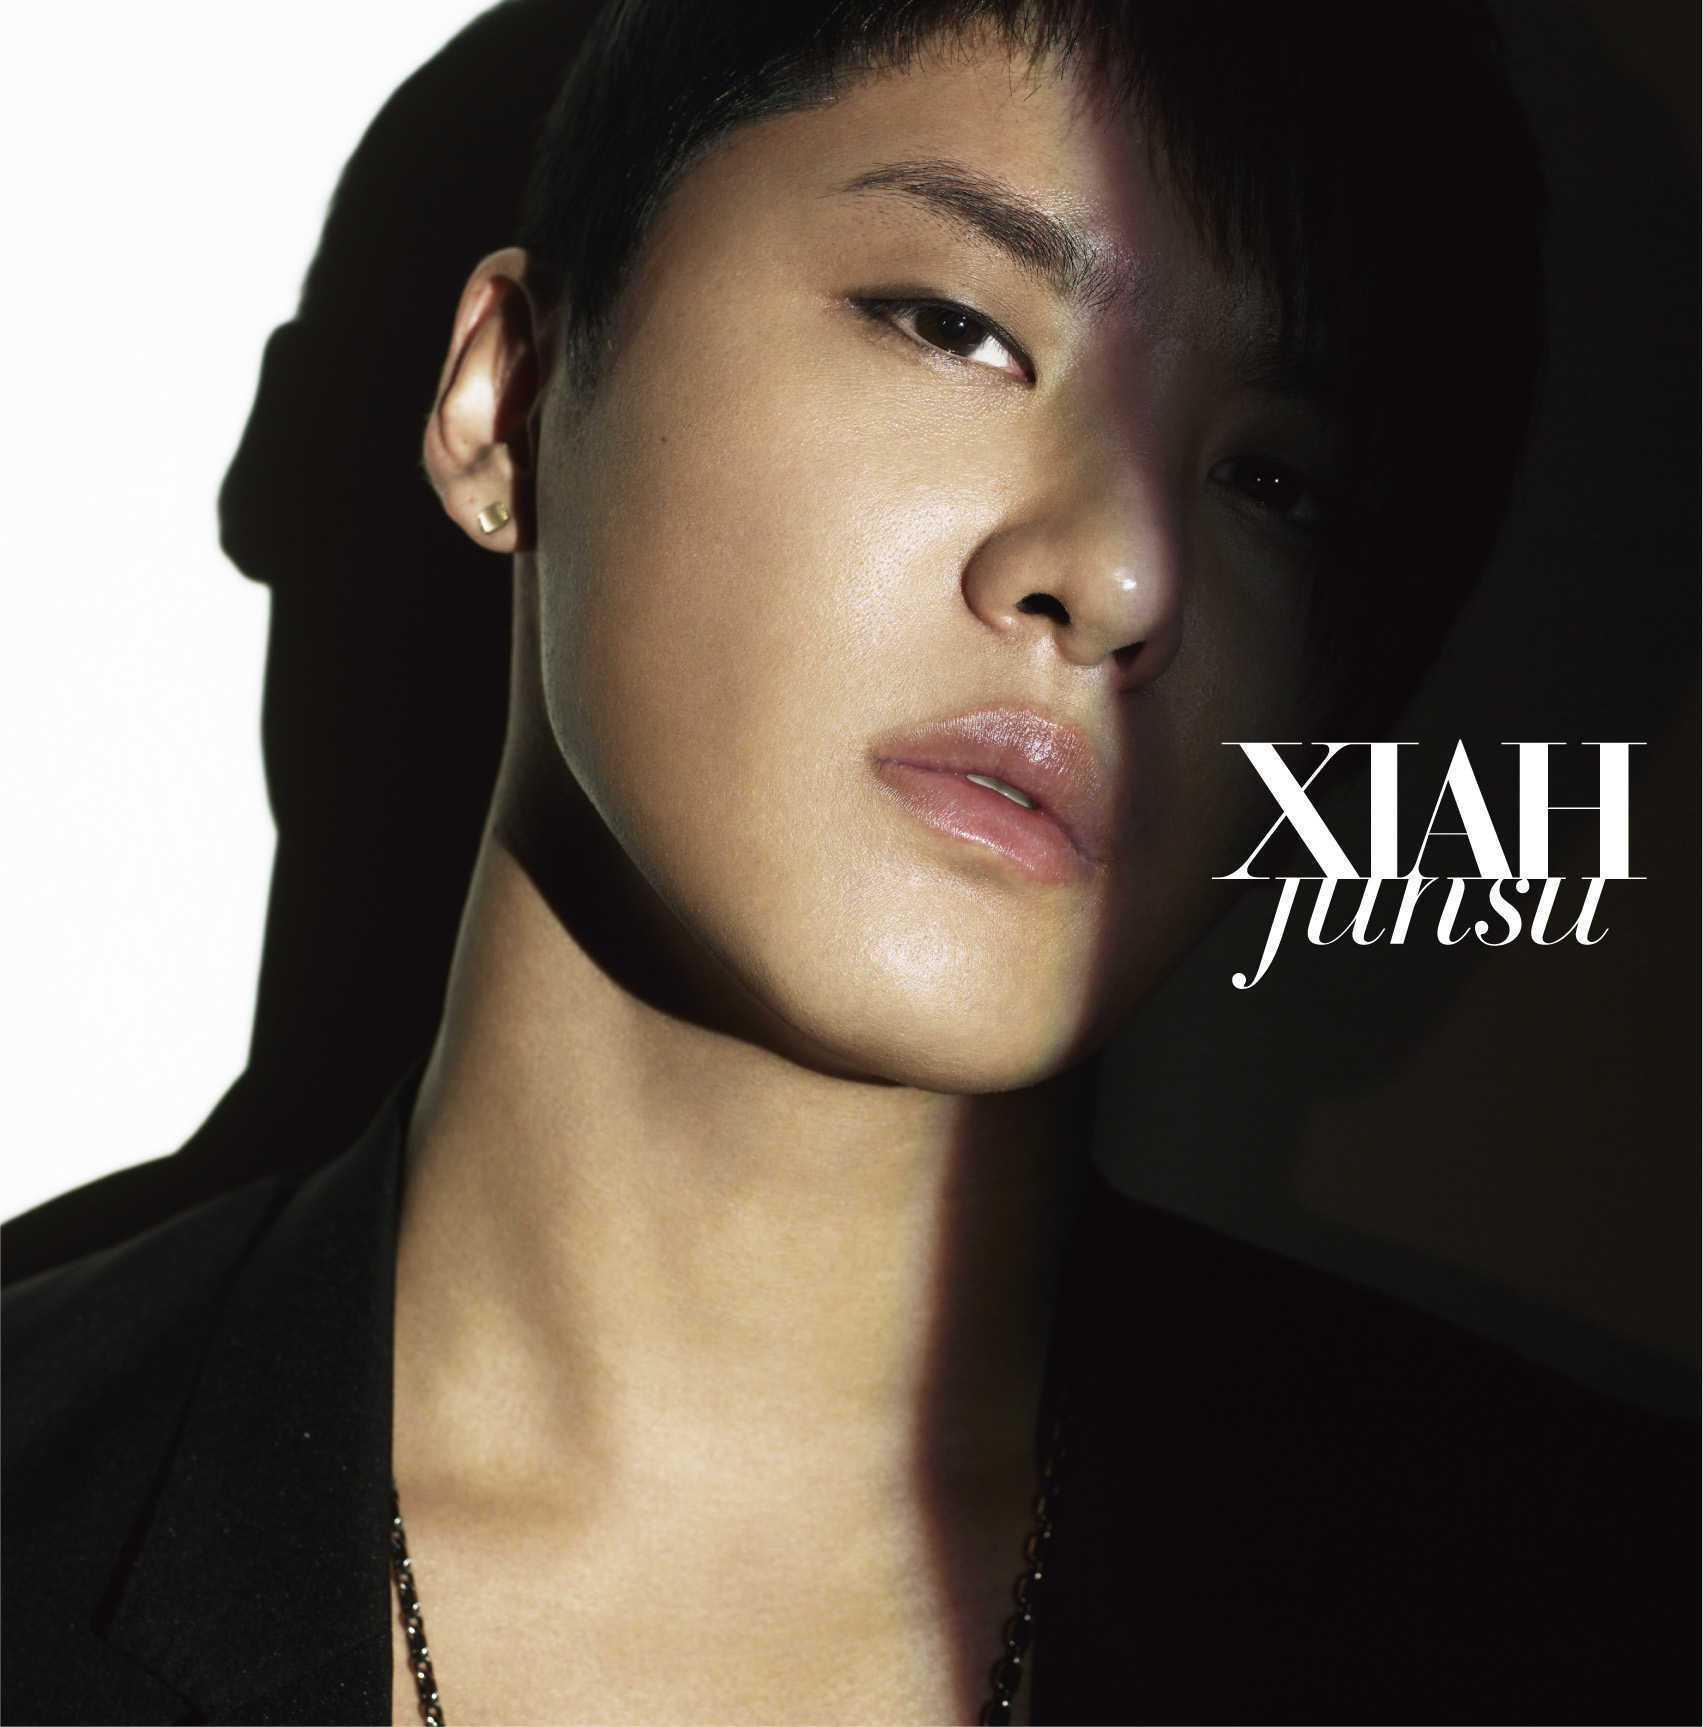 Kim Junsu album